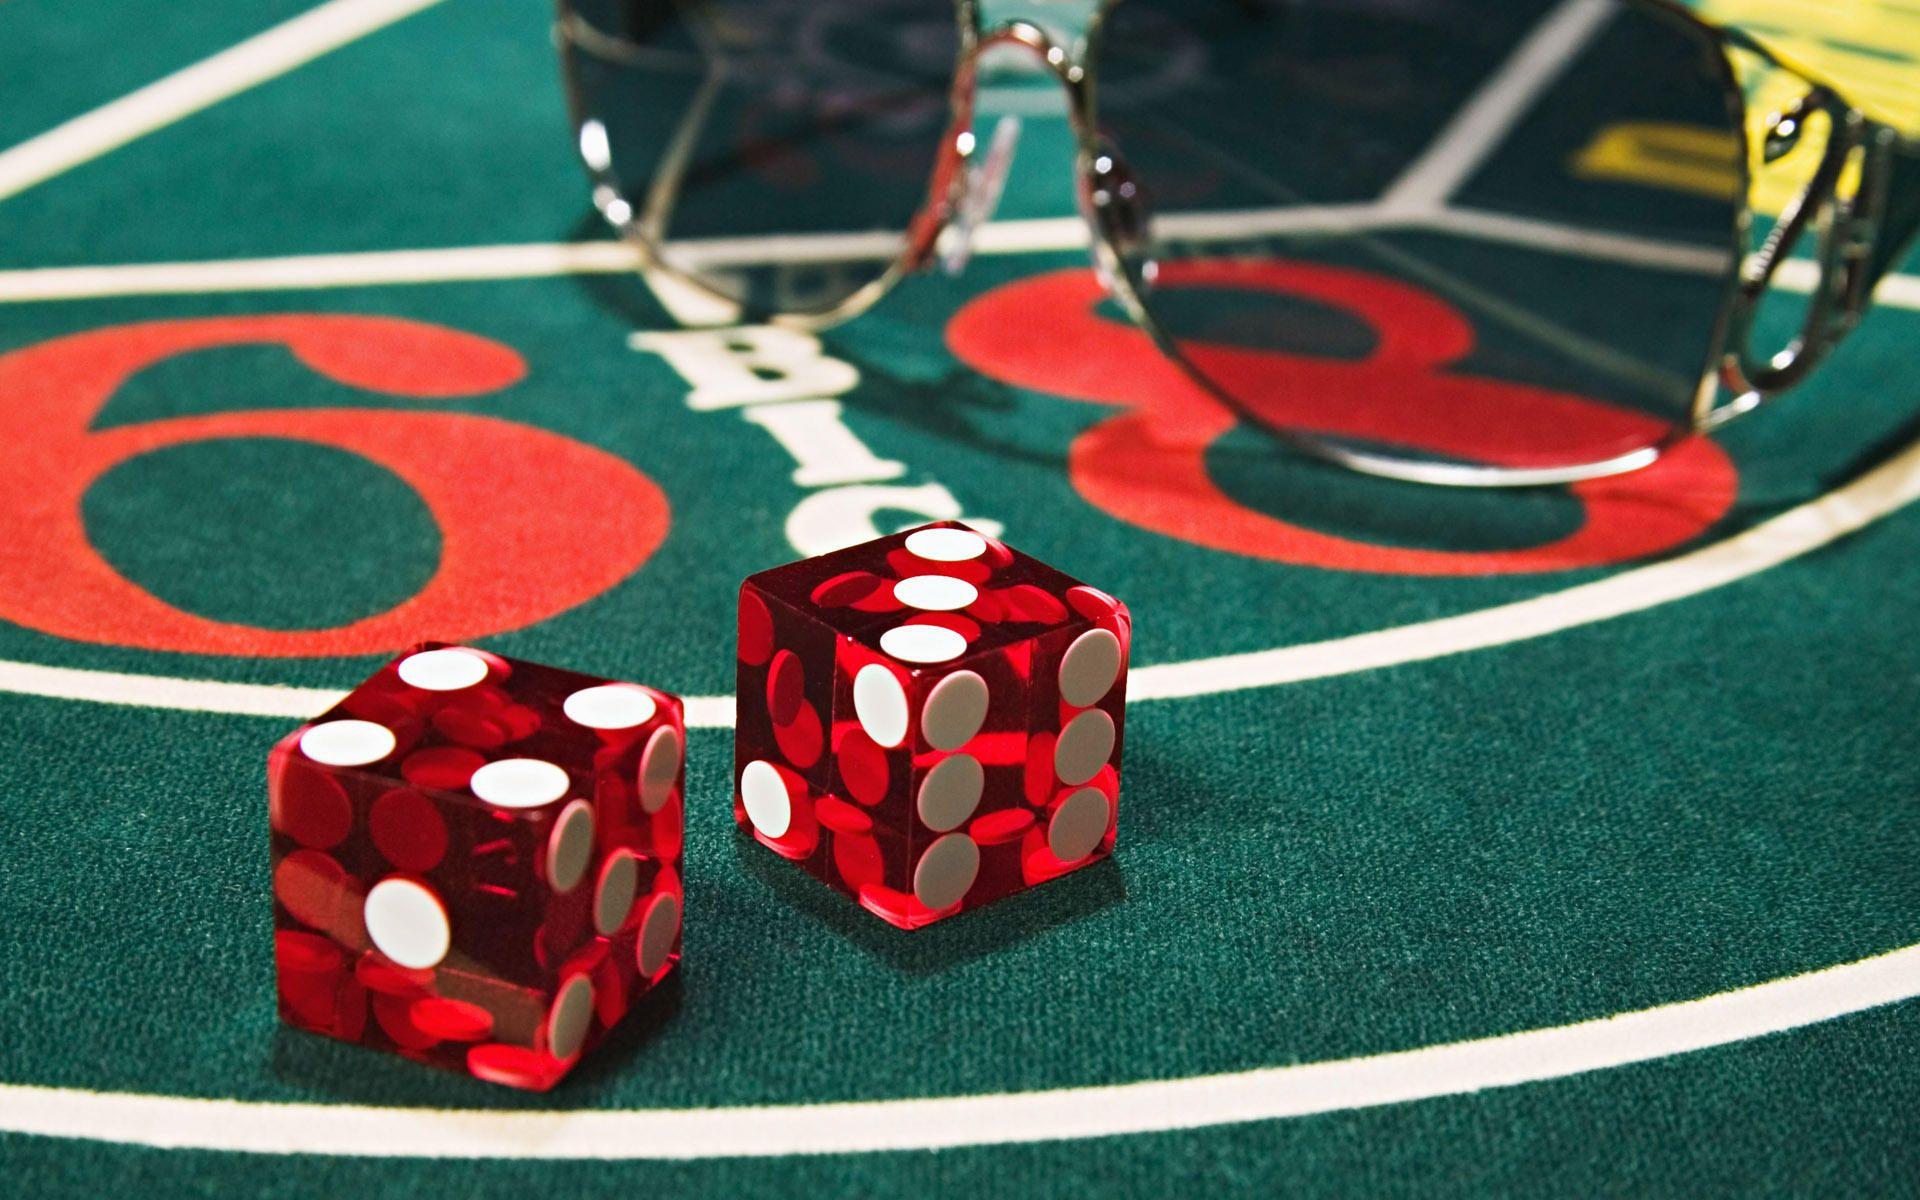 Mistakes In Online Gambling That Make You Look Dumb